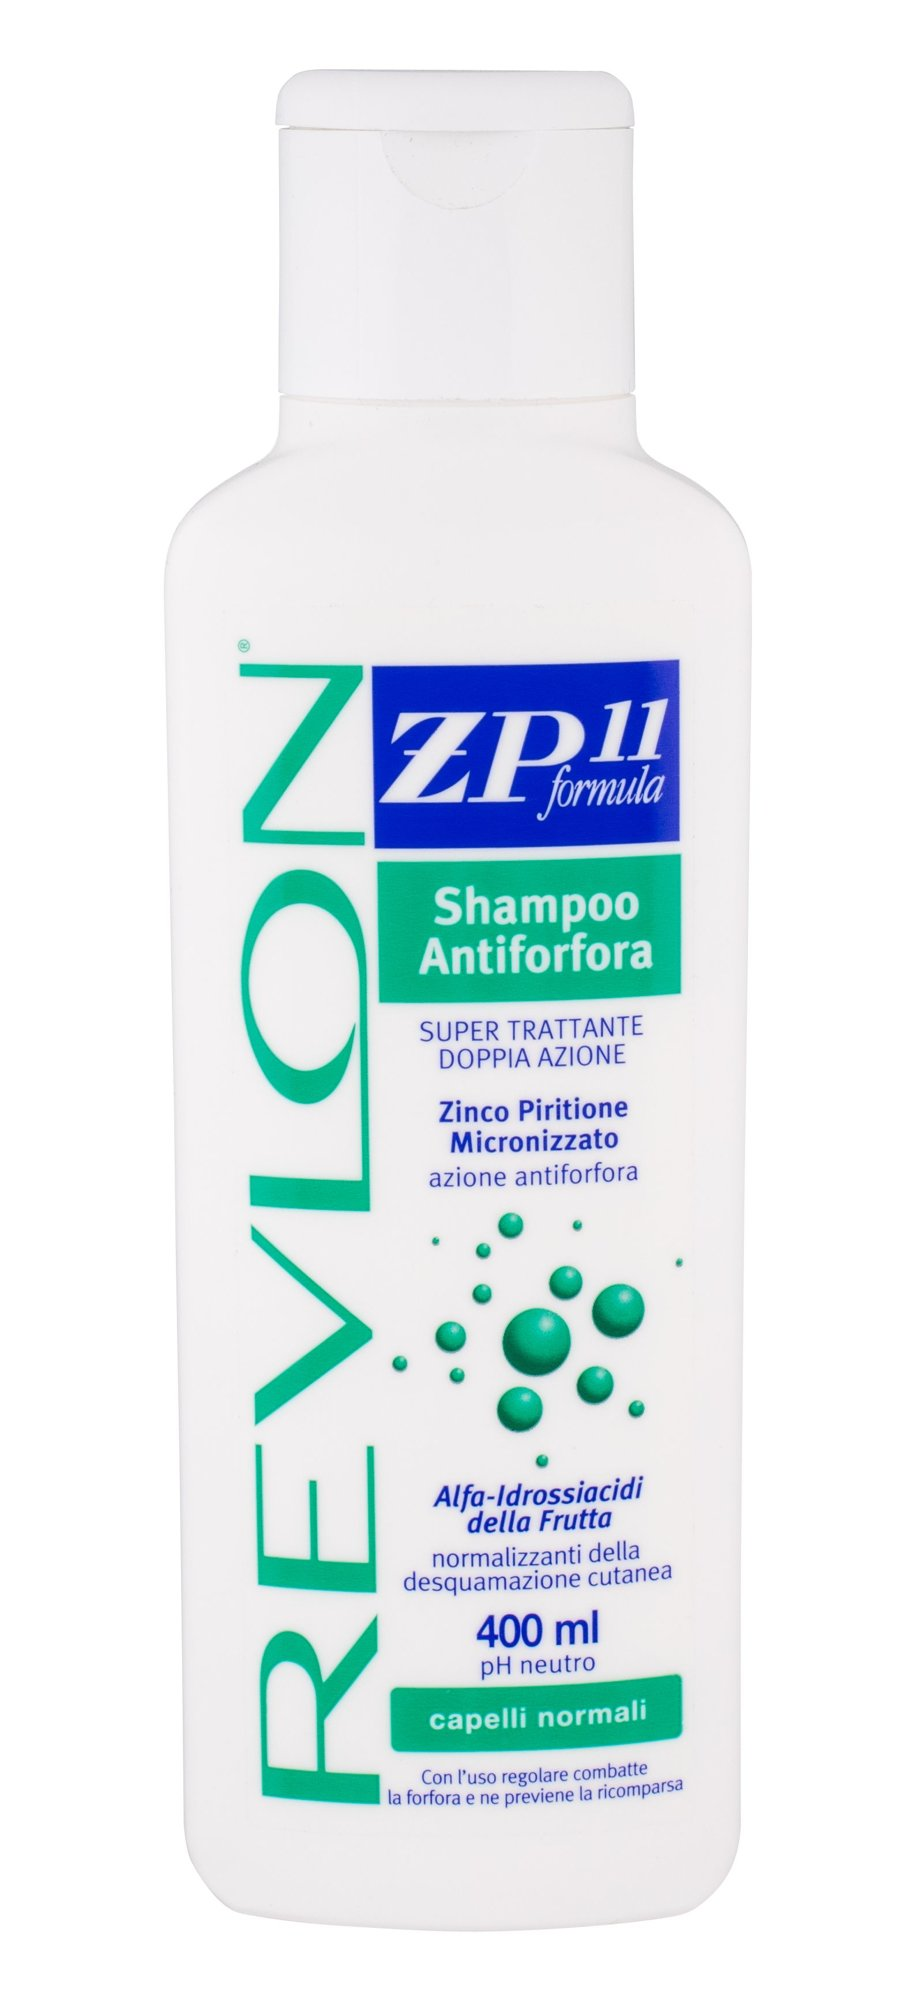 Revlon Professional ZP11 Formula Cosmetic 400ml